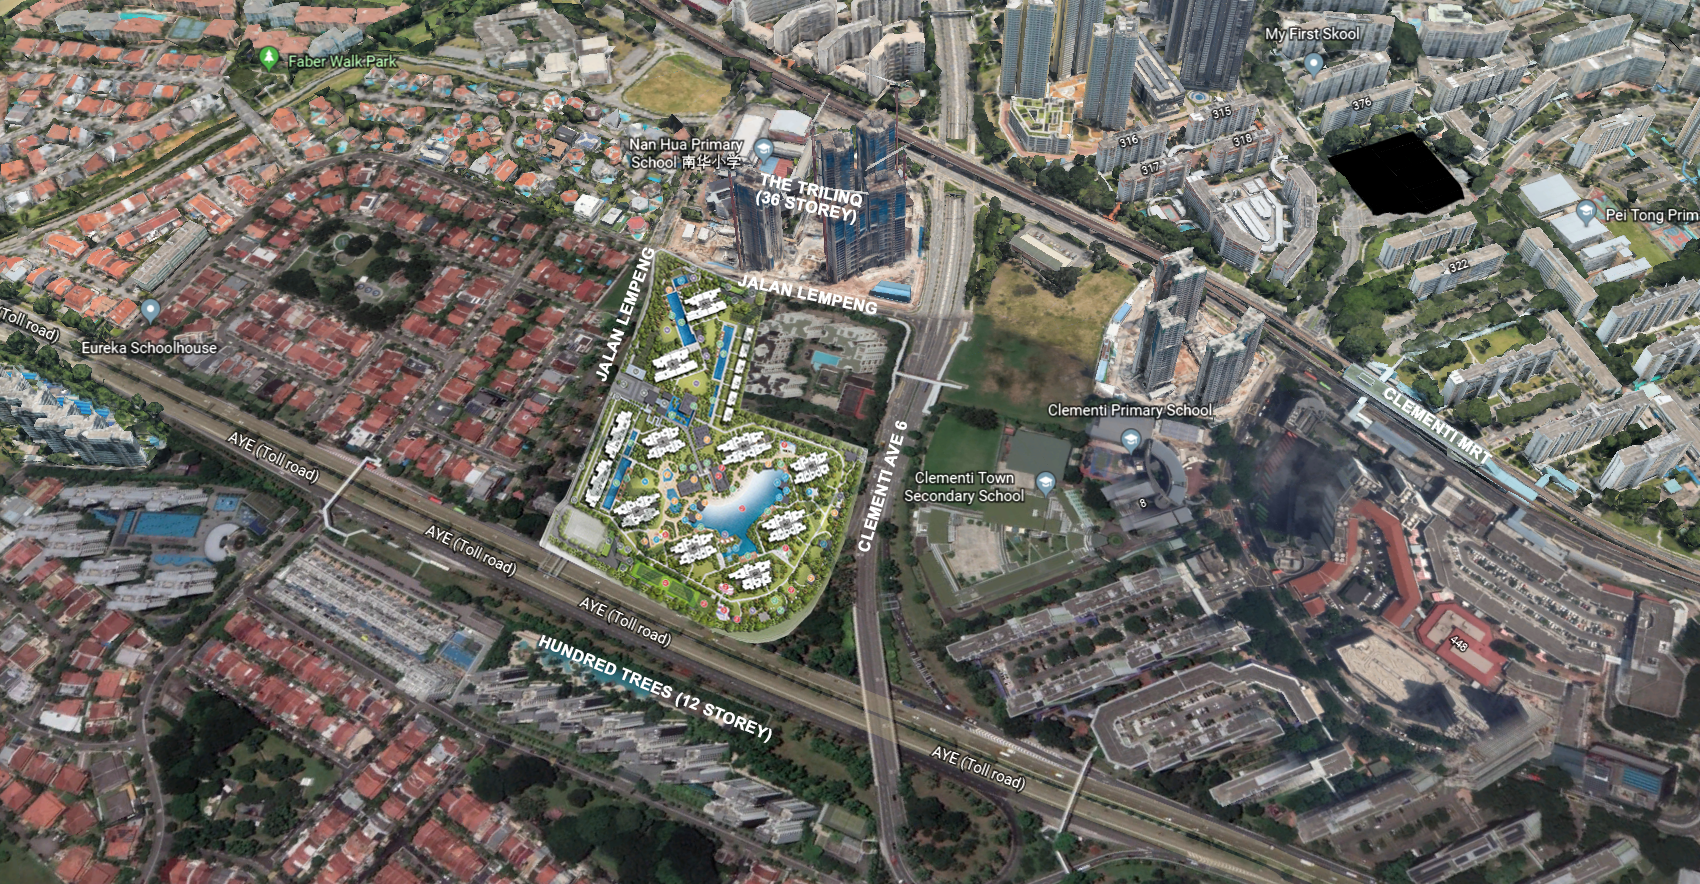 Google Map Parc Clematis